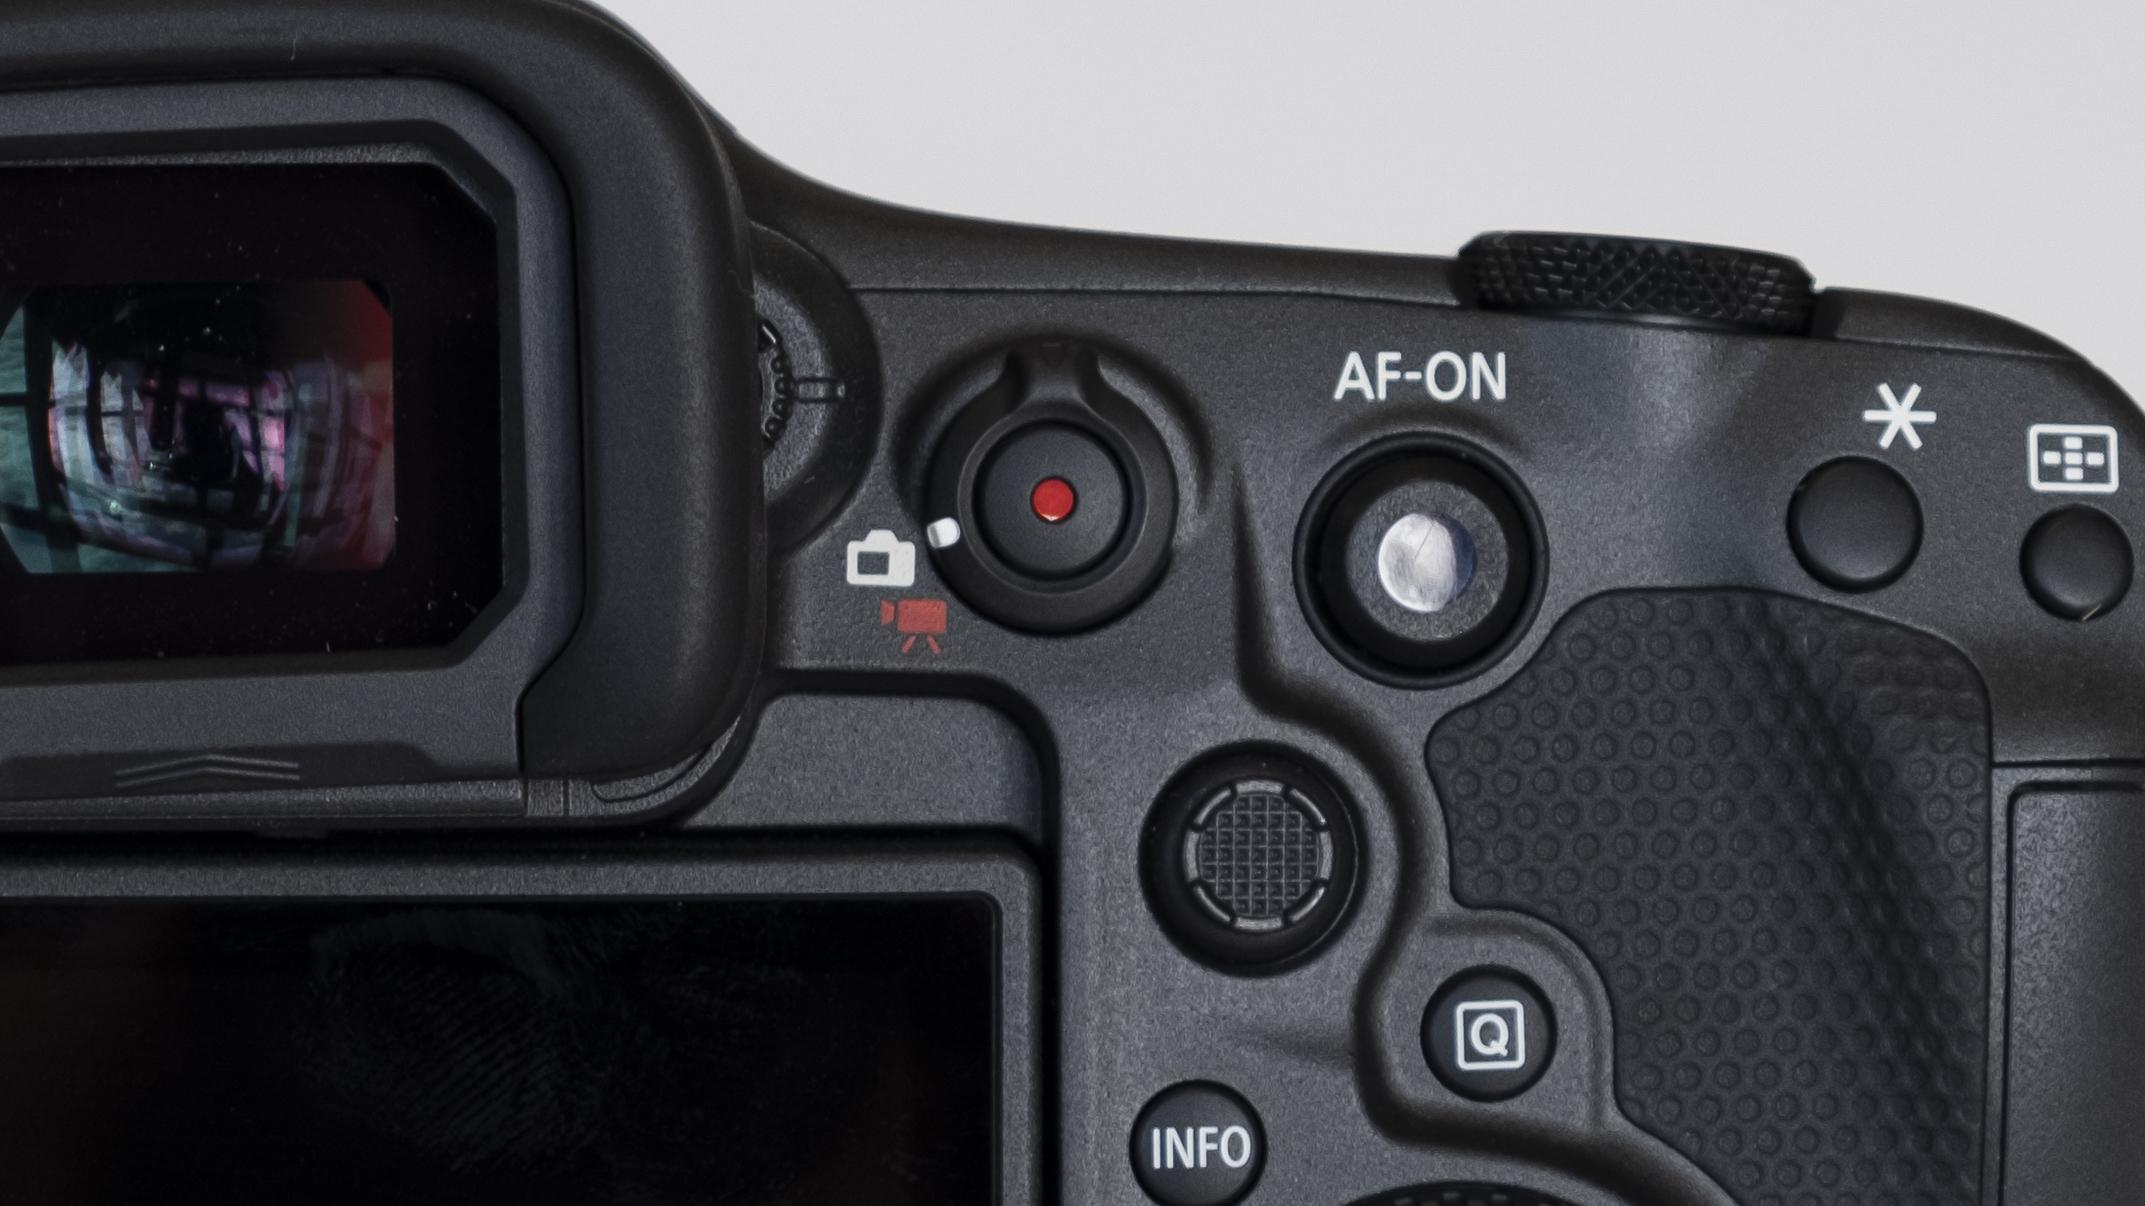 The smart controller button on the Canon EOS R3 mirrorless camera